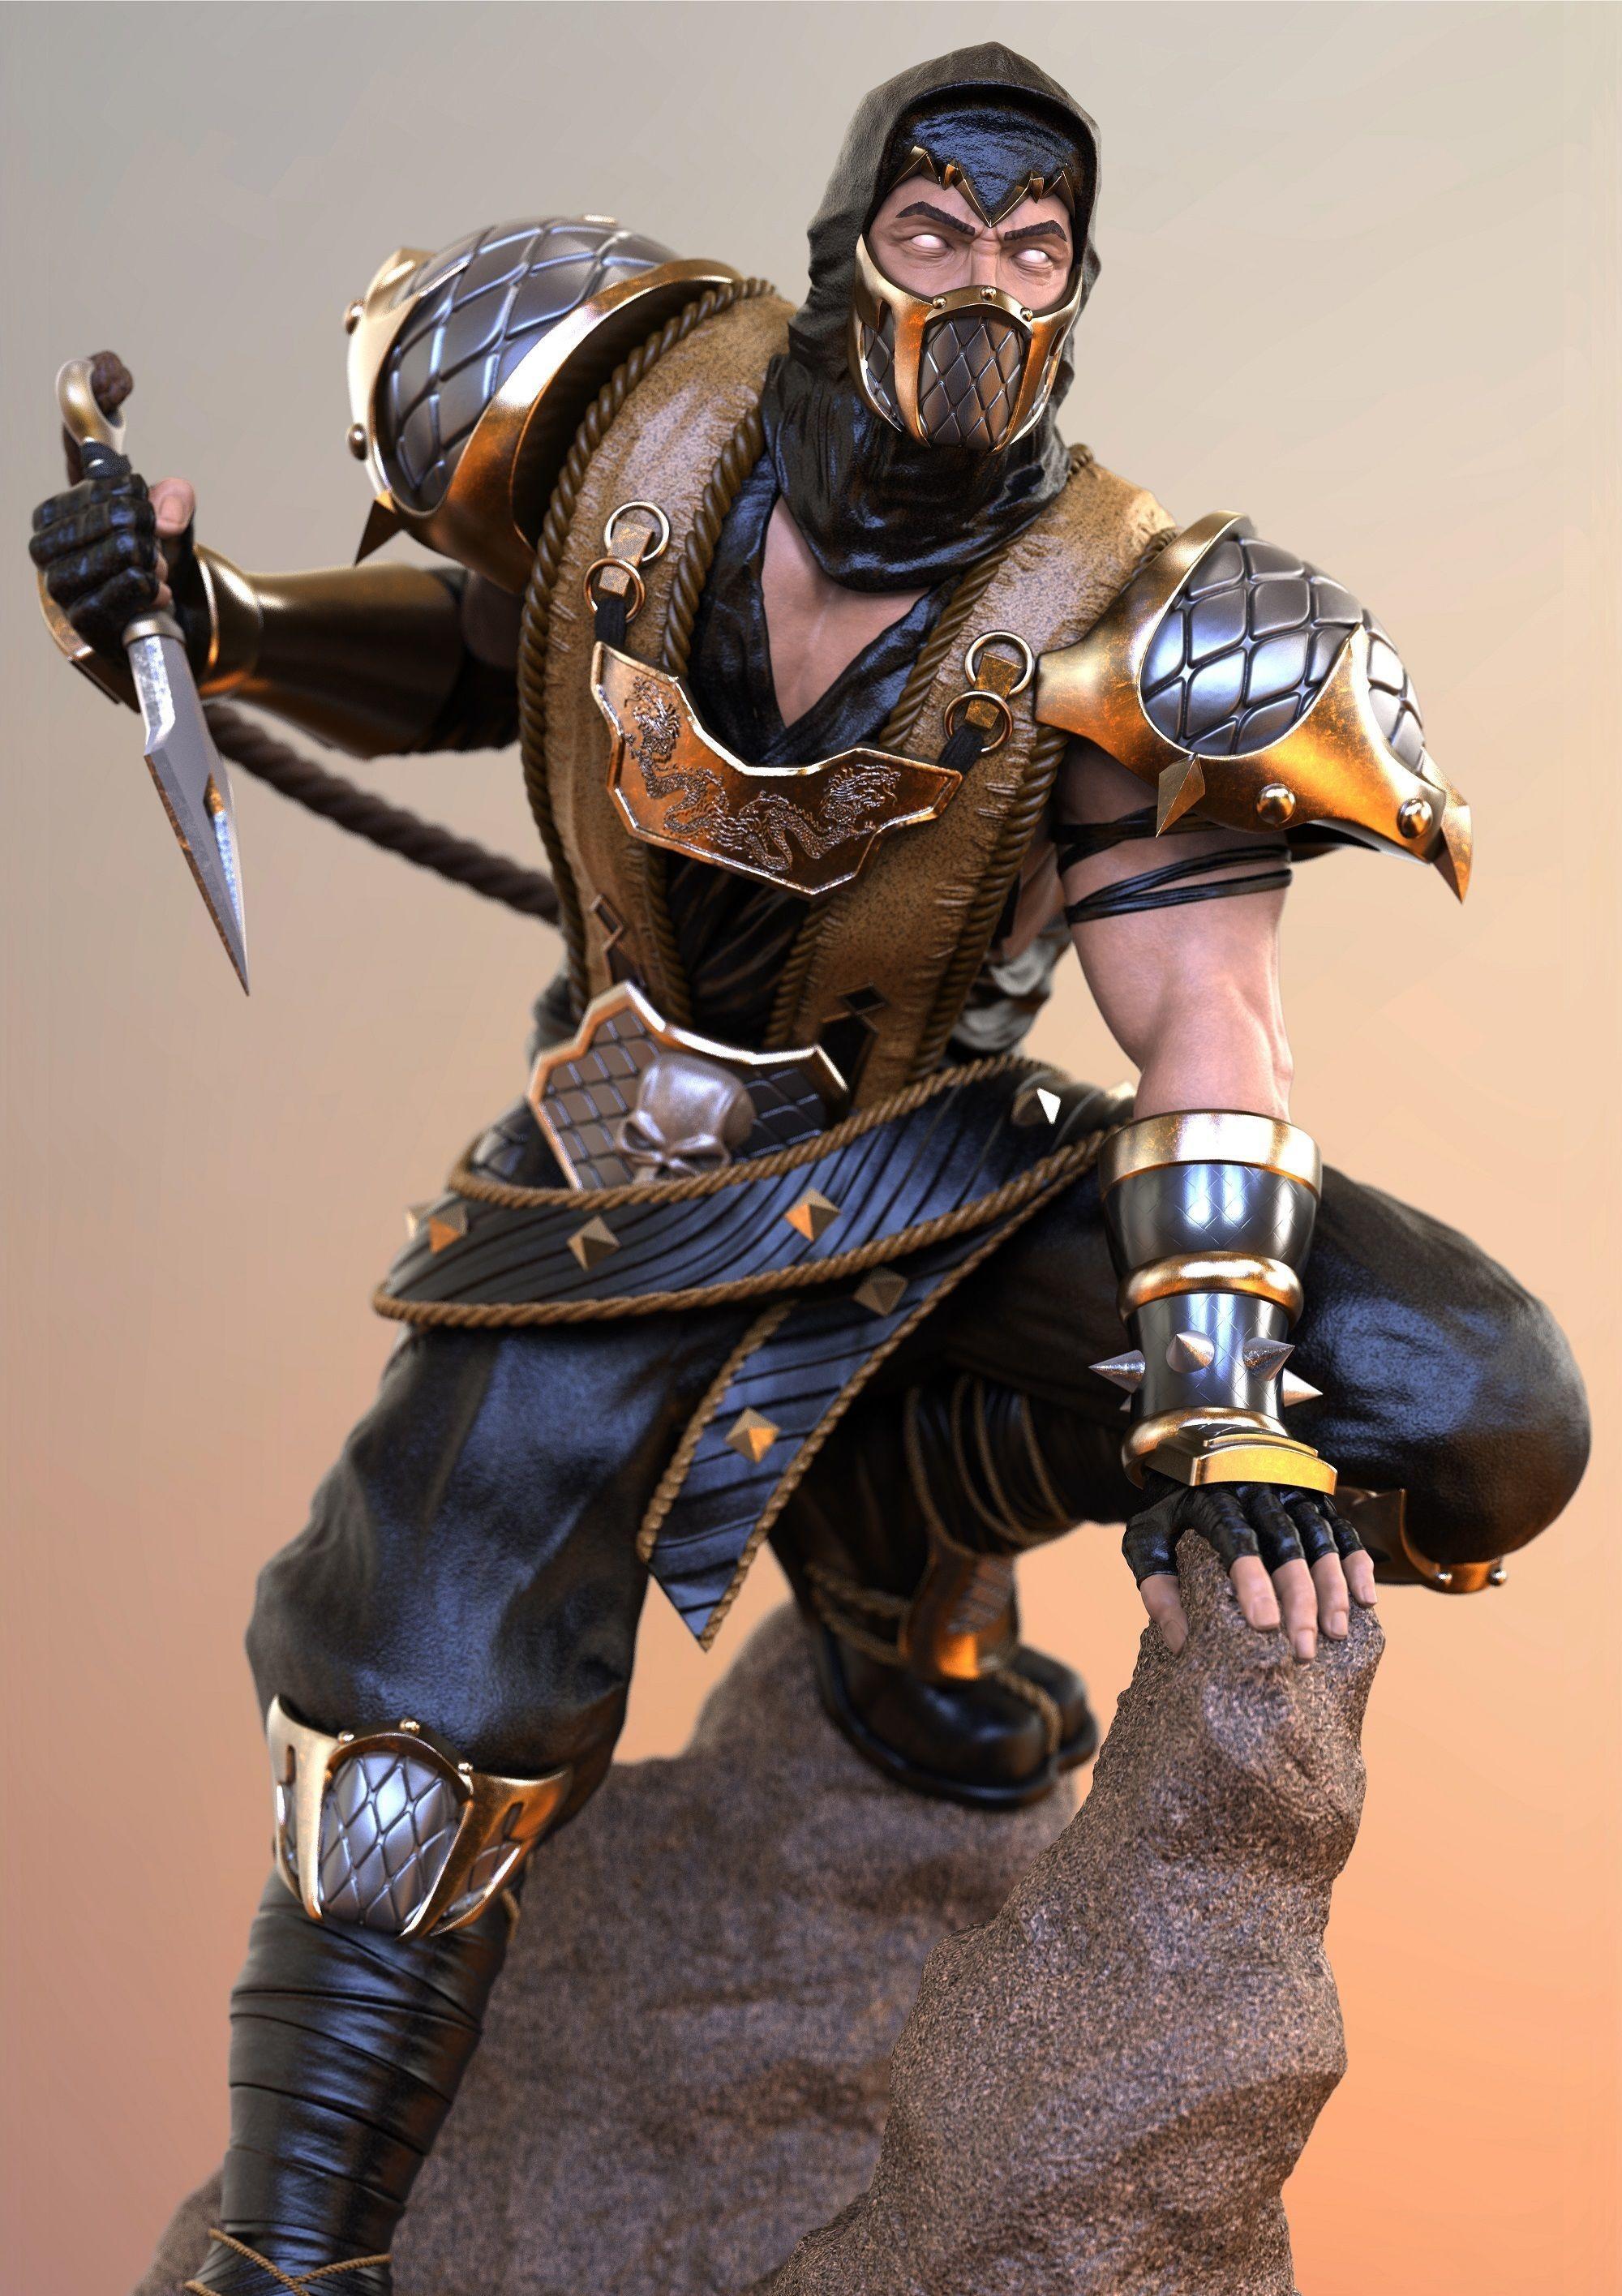 Scorpion Mortal Kombat Deception 3d Printable Model